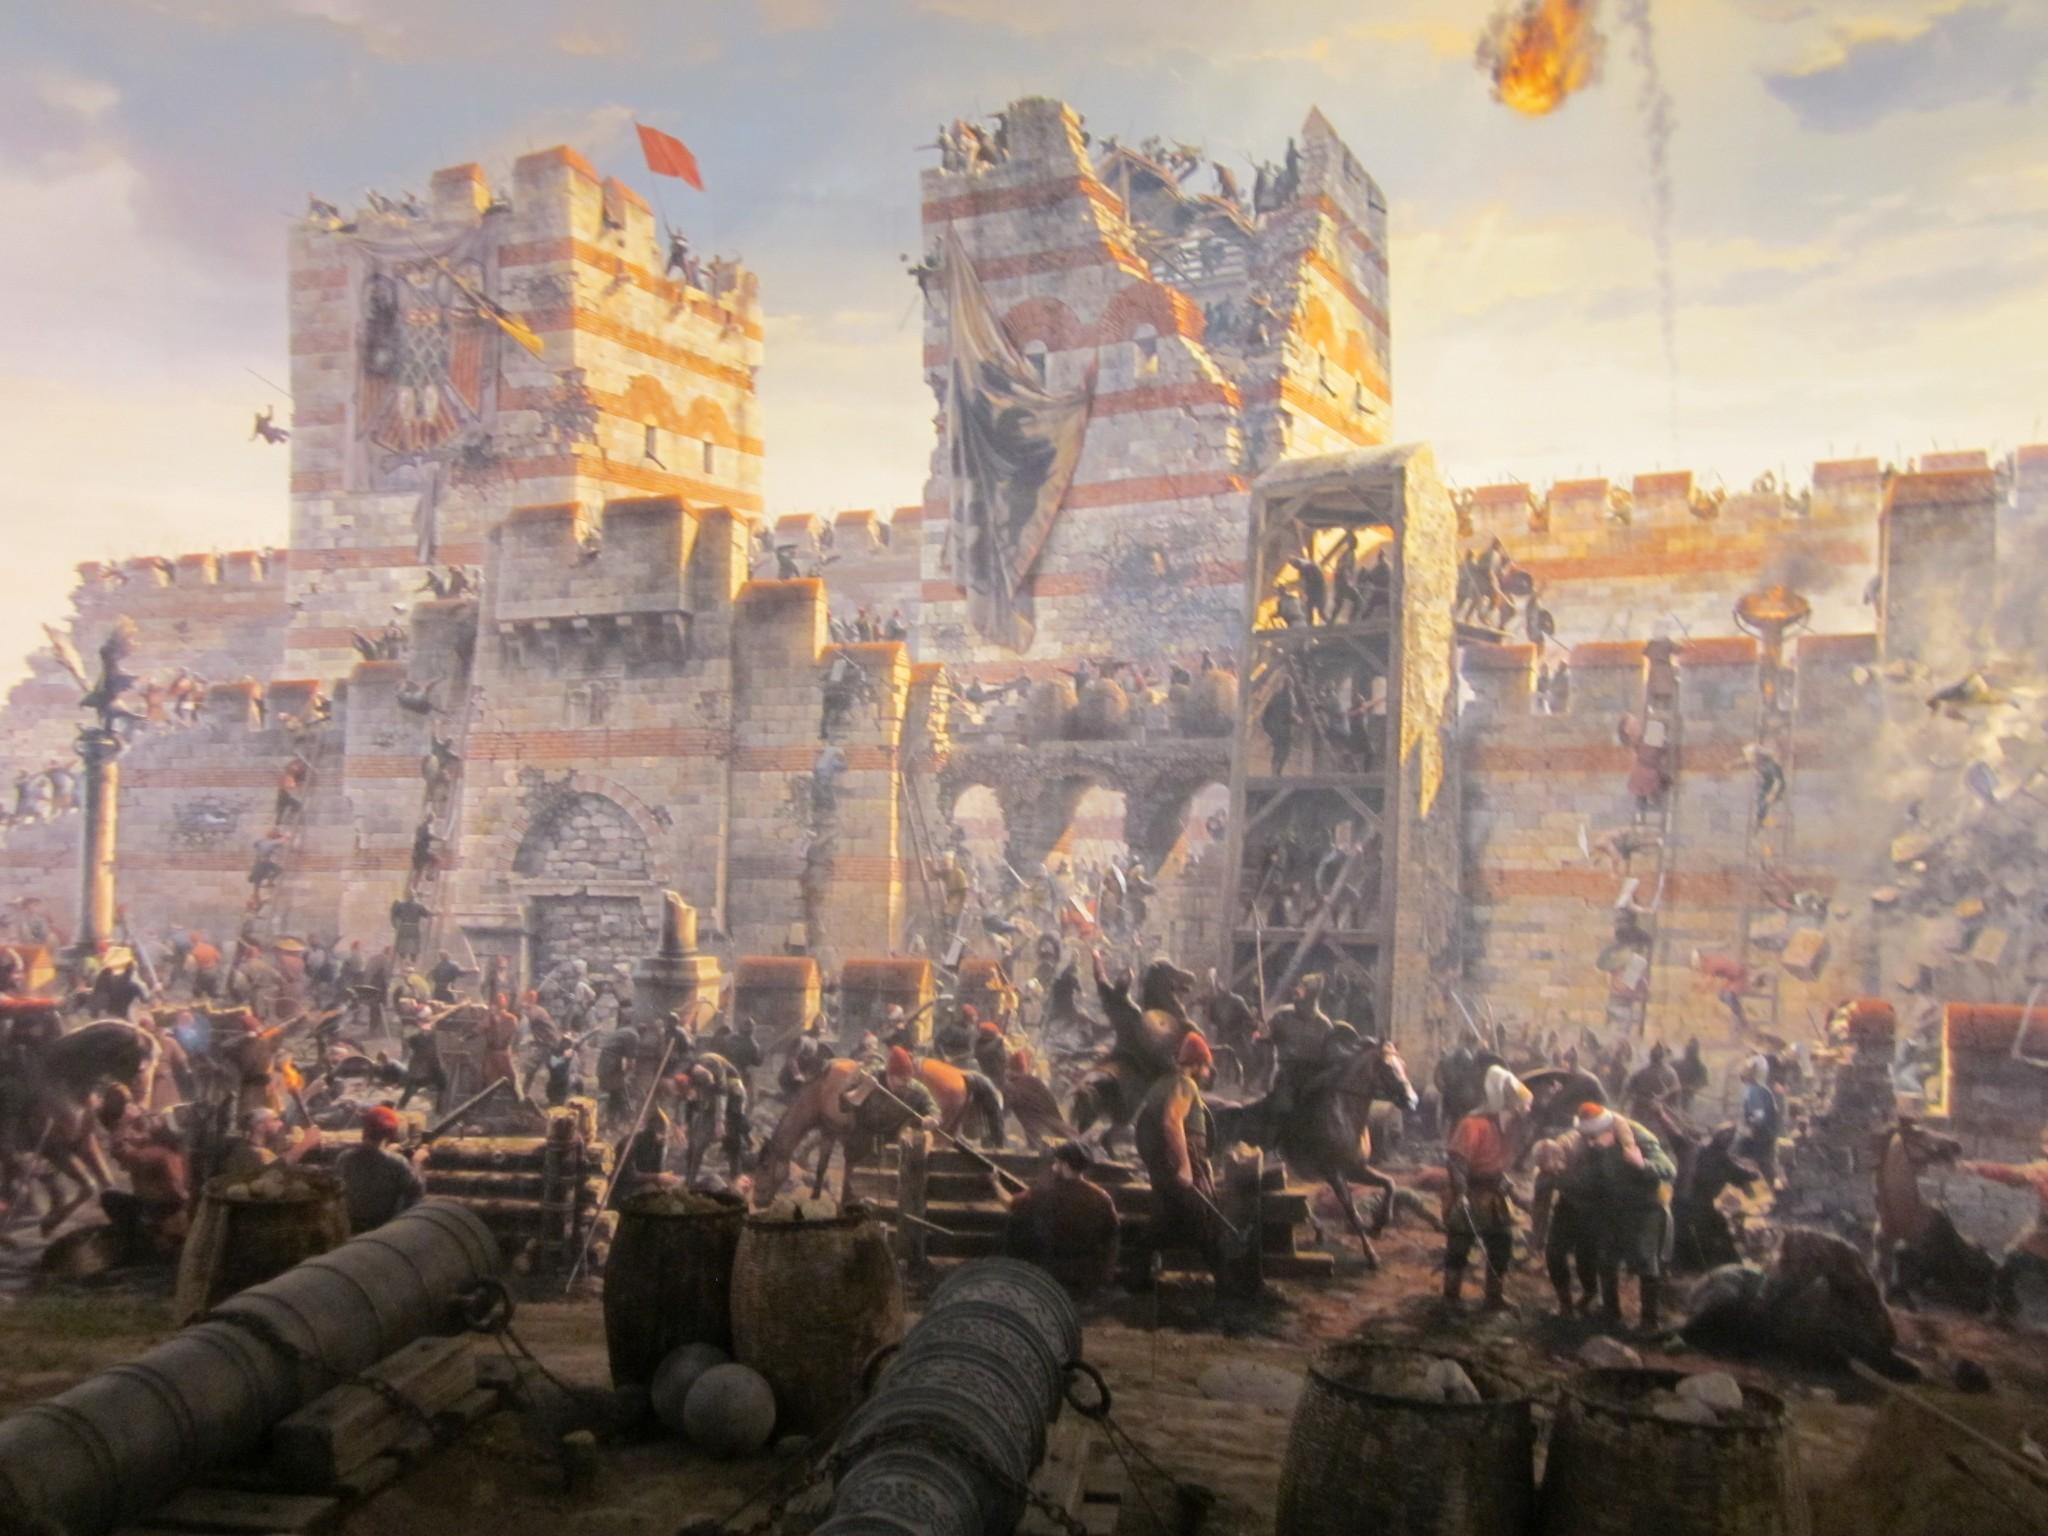 File:Panorama 1453 History Museum 5.JPG